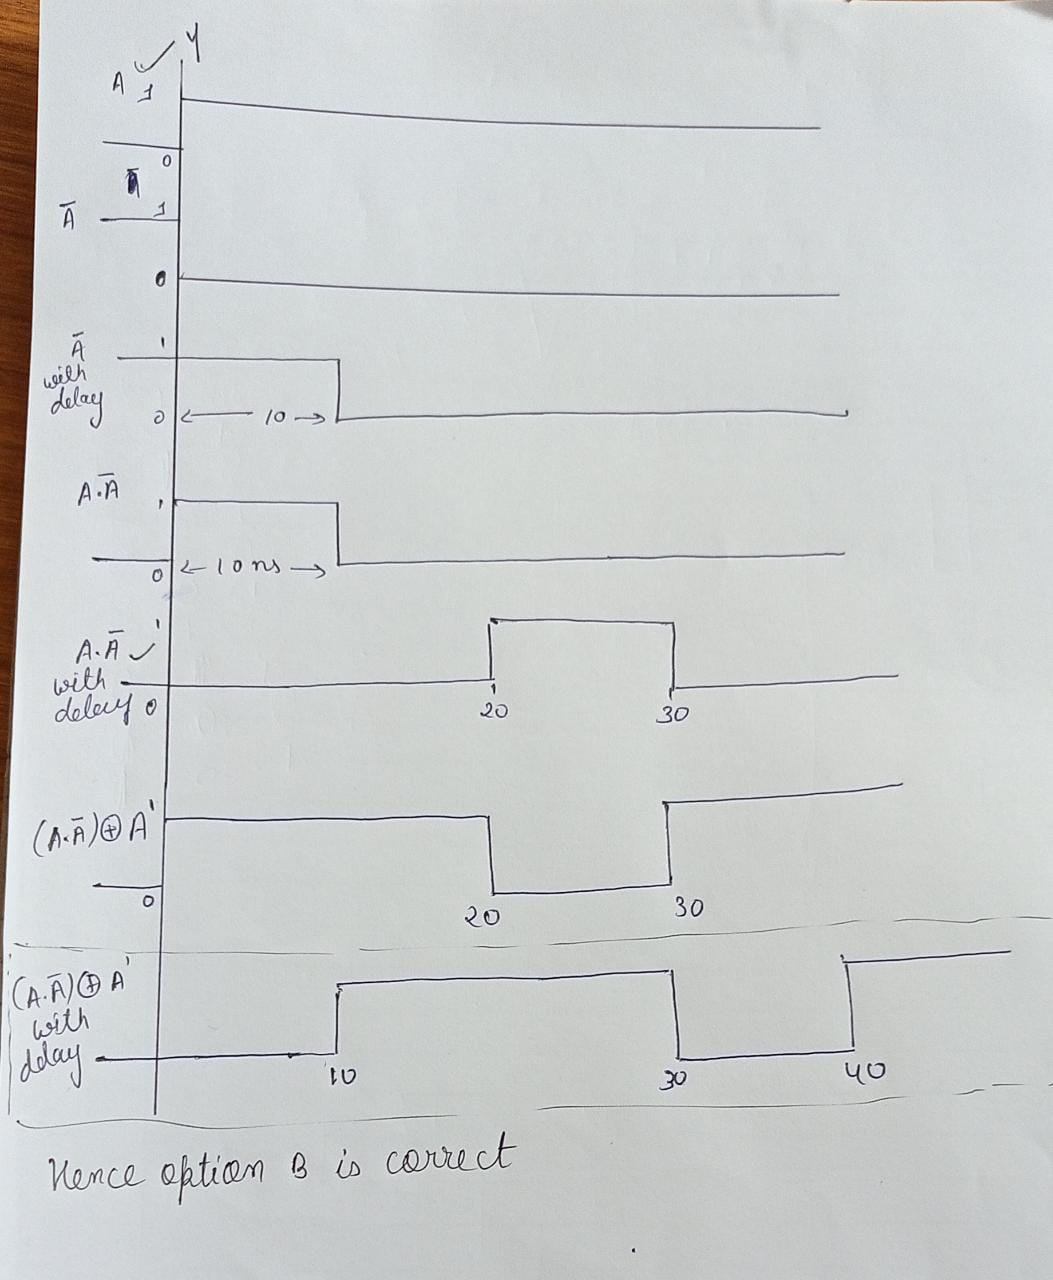 Answered: MadeEasy Subject Test: Digital Logic - Circuit Output